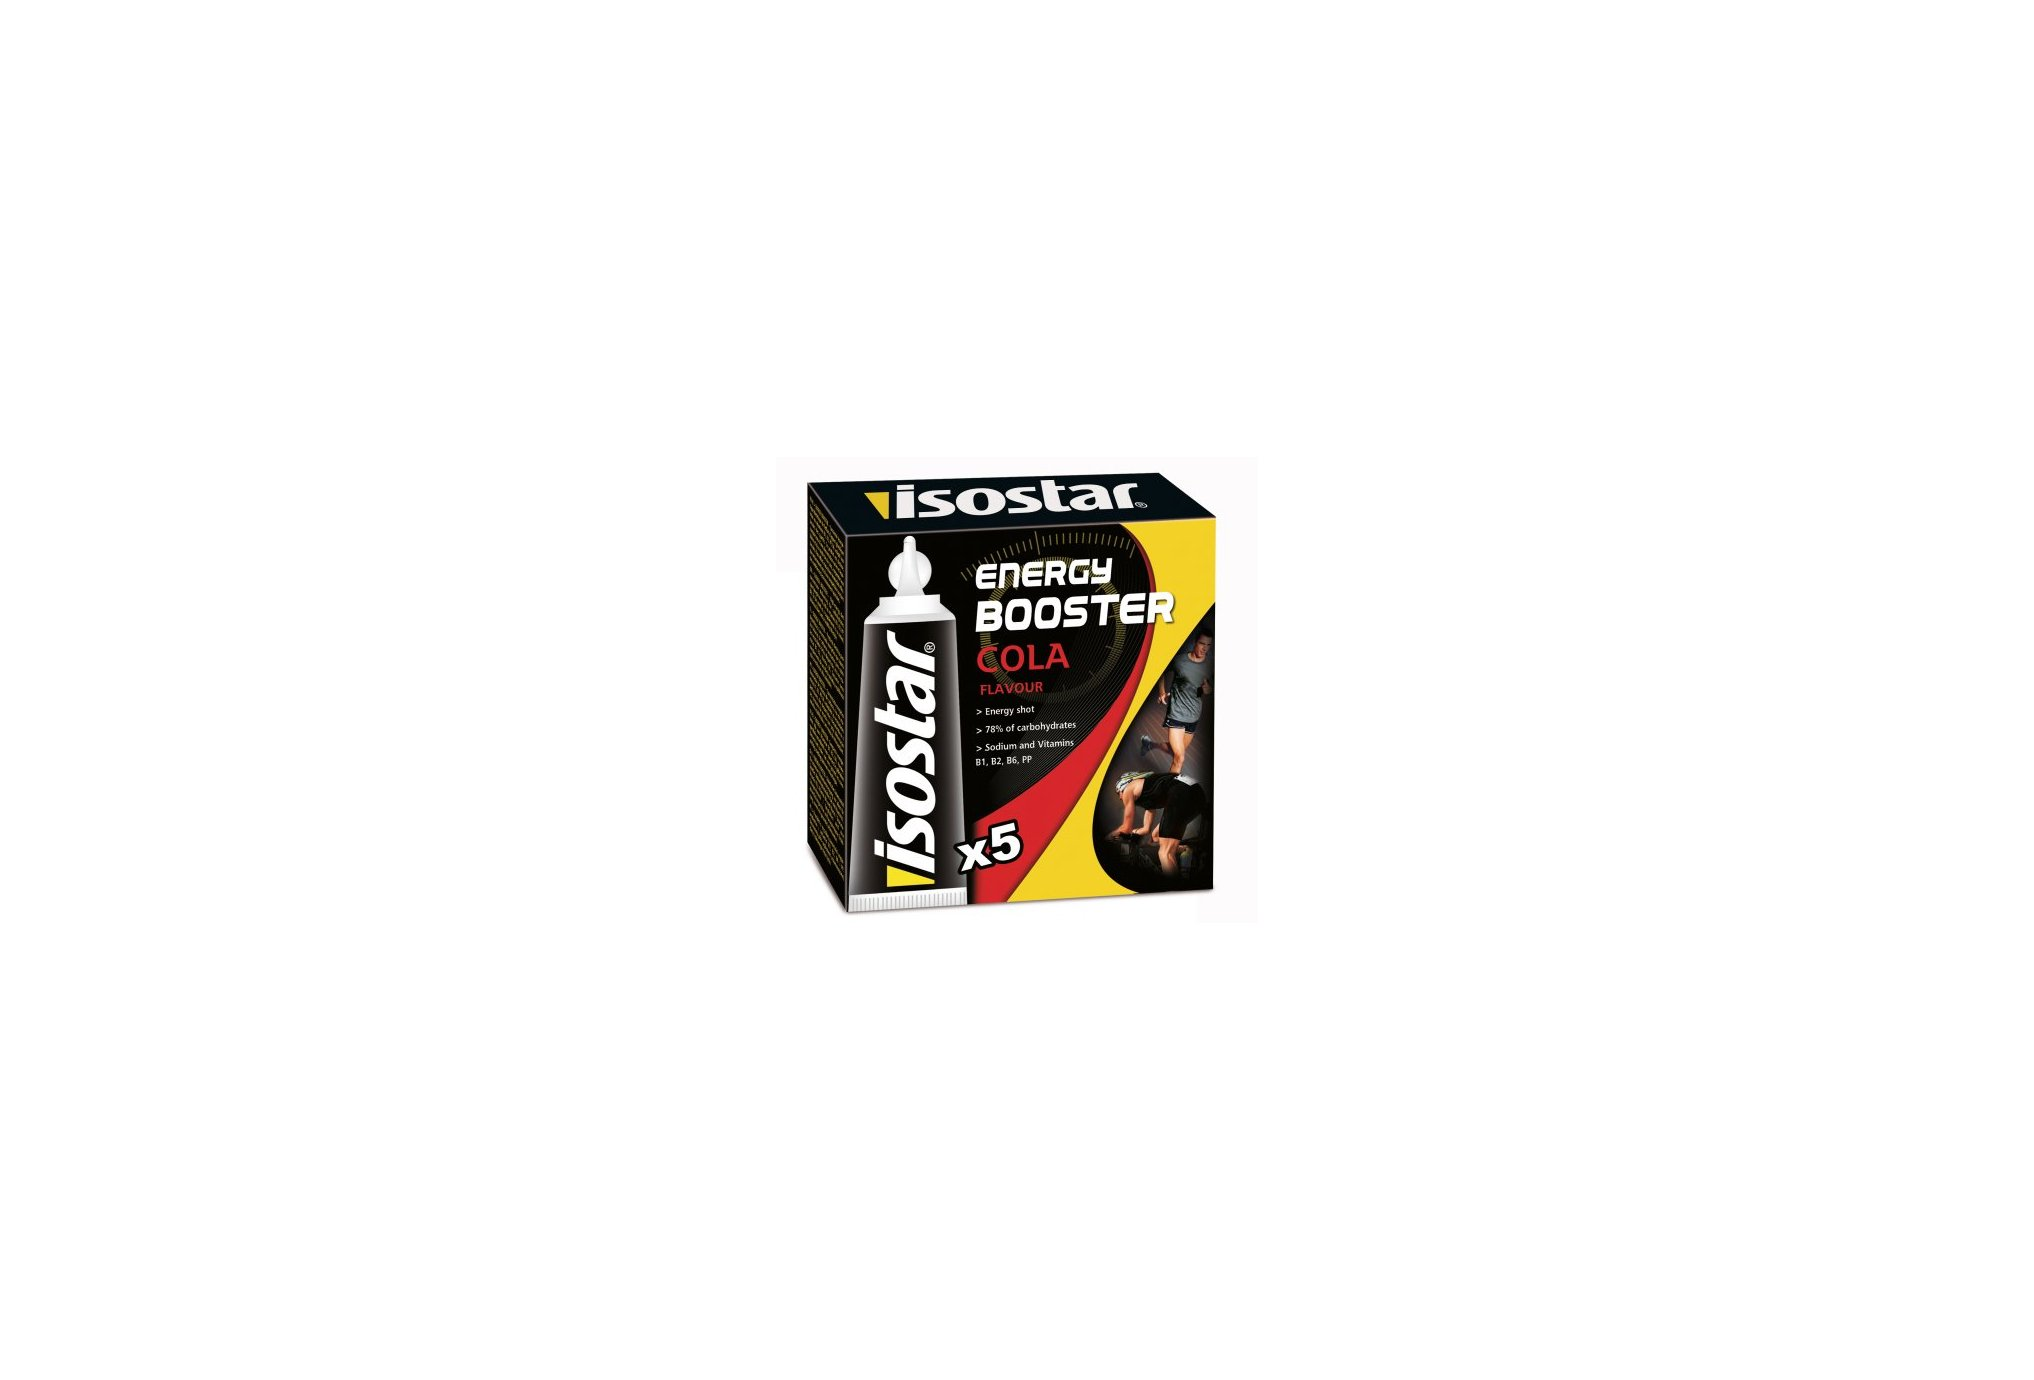 Isostar Gel Energy Booster - Cola Diététique Gels